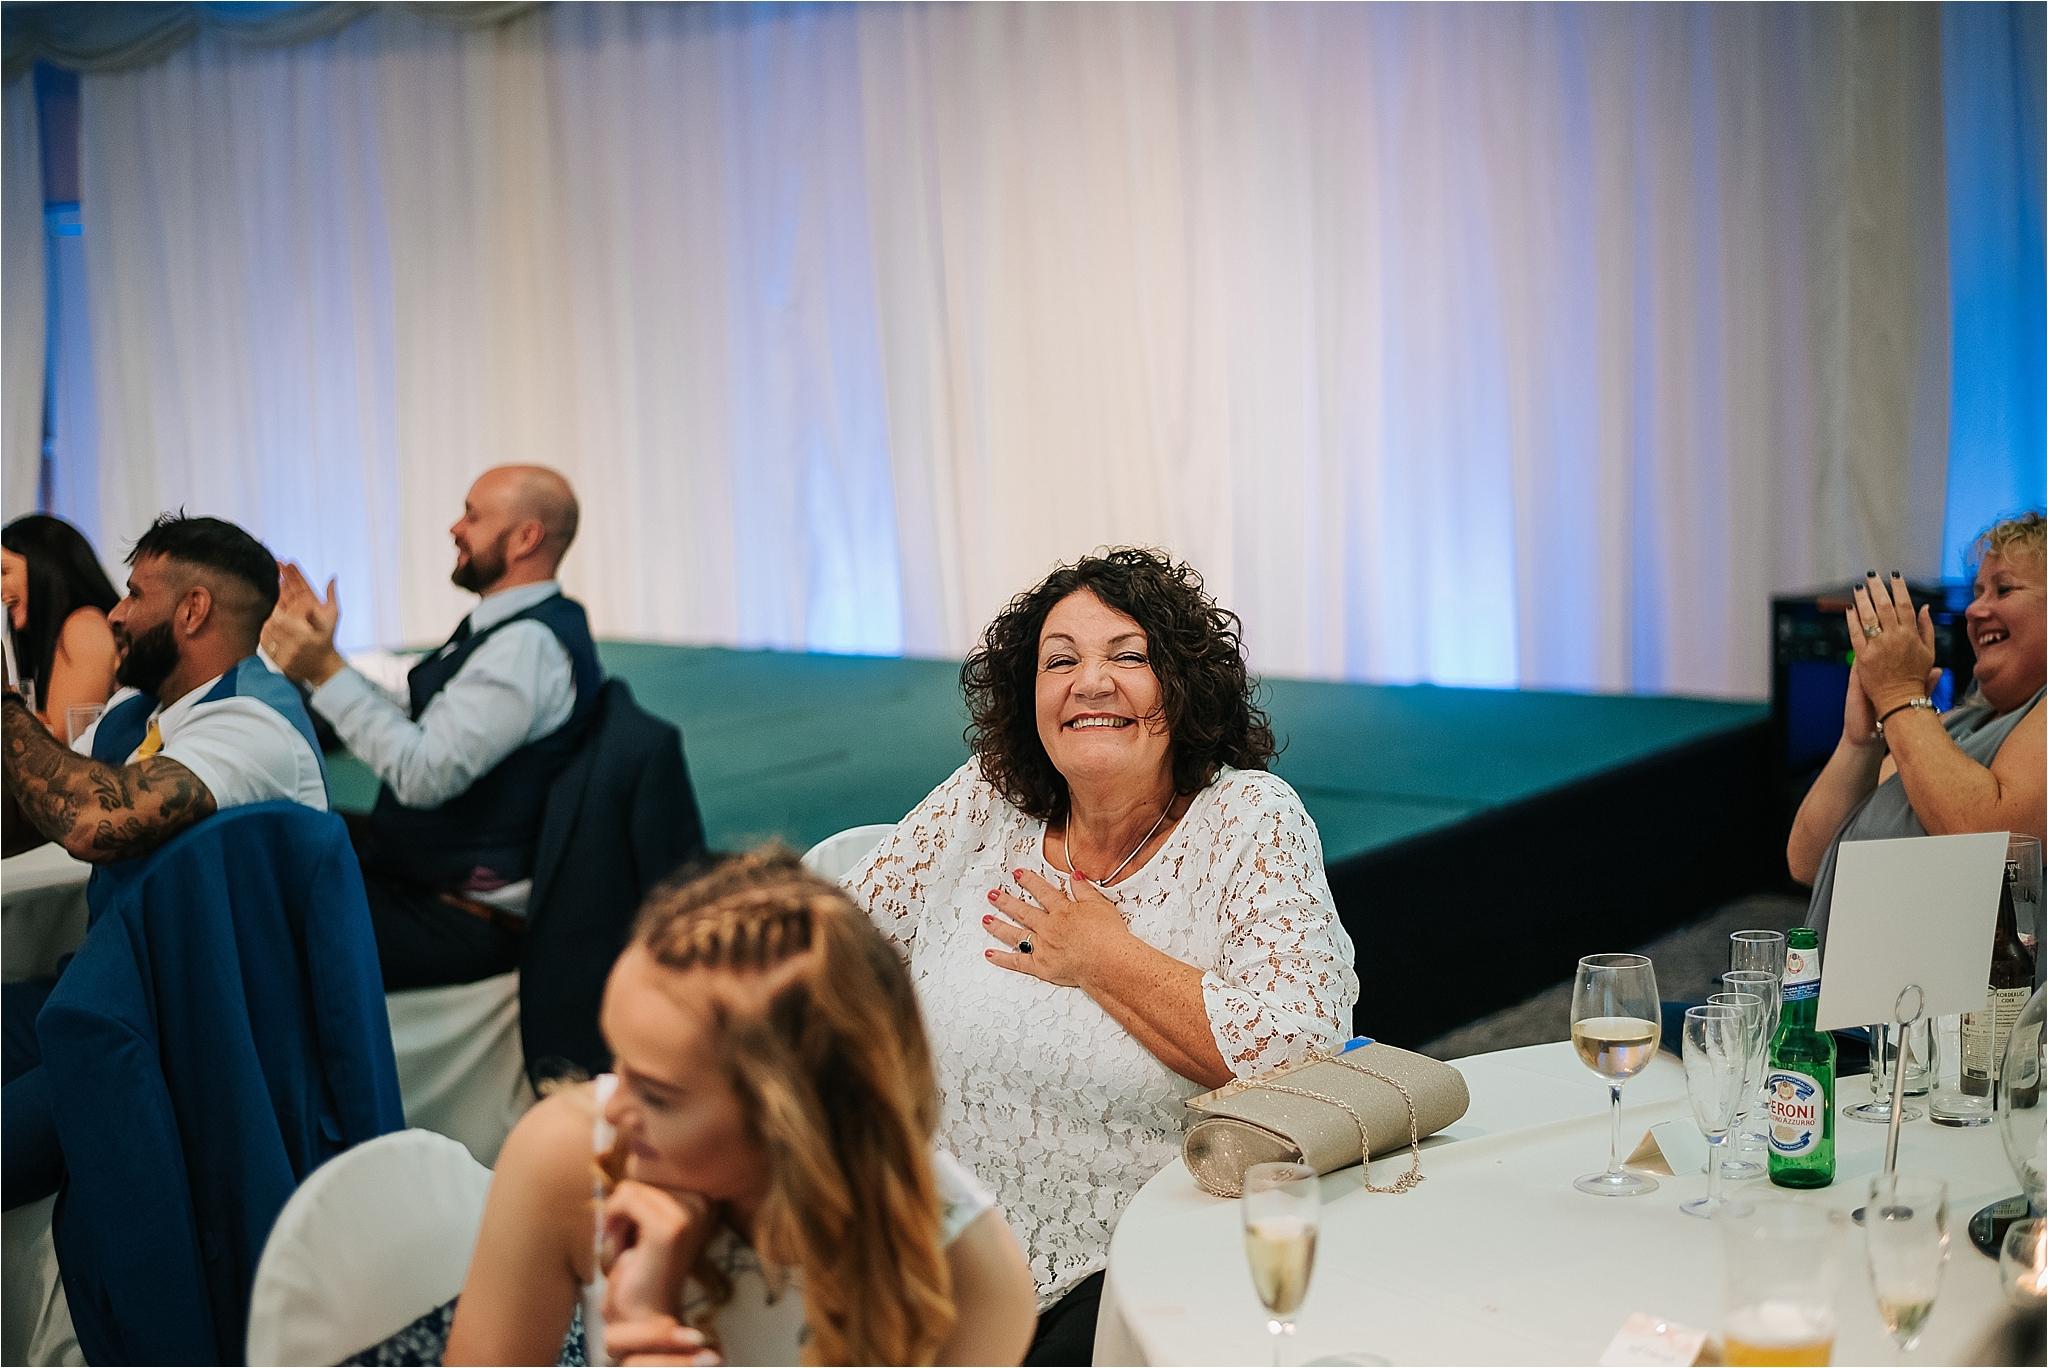 thevilla+lancashire+wreagreen+wedding+photographer56.jpg